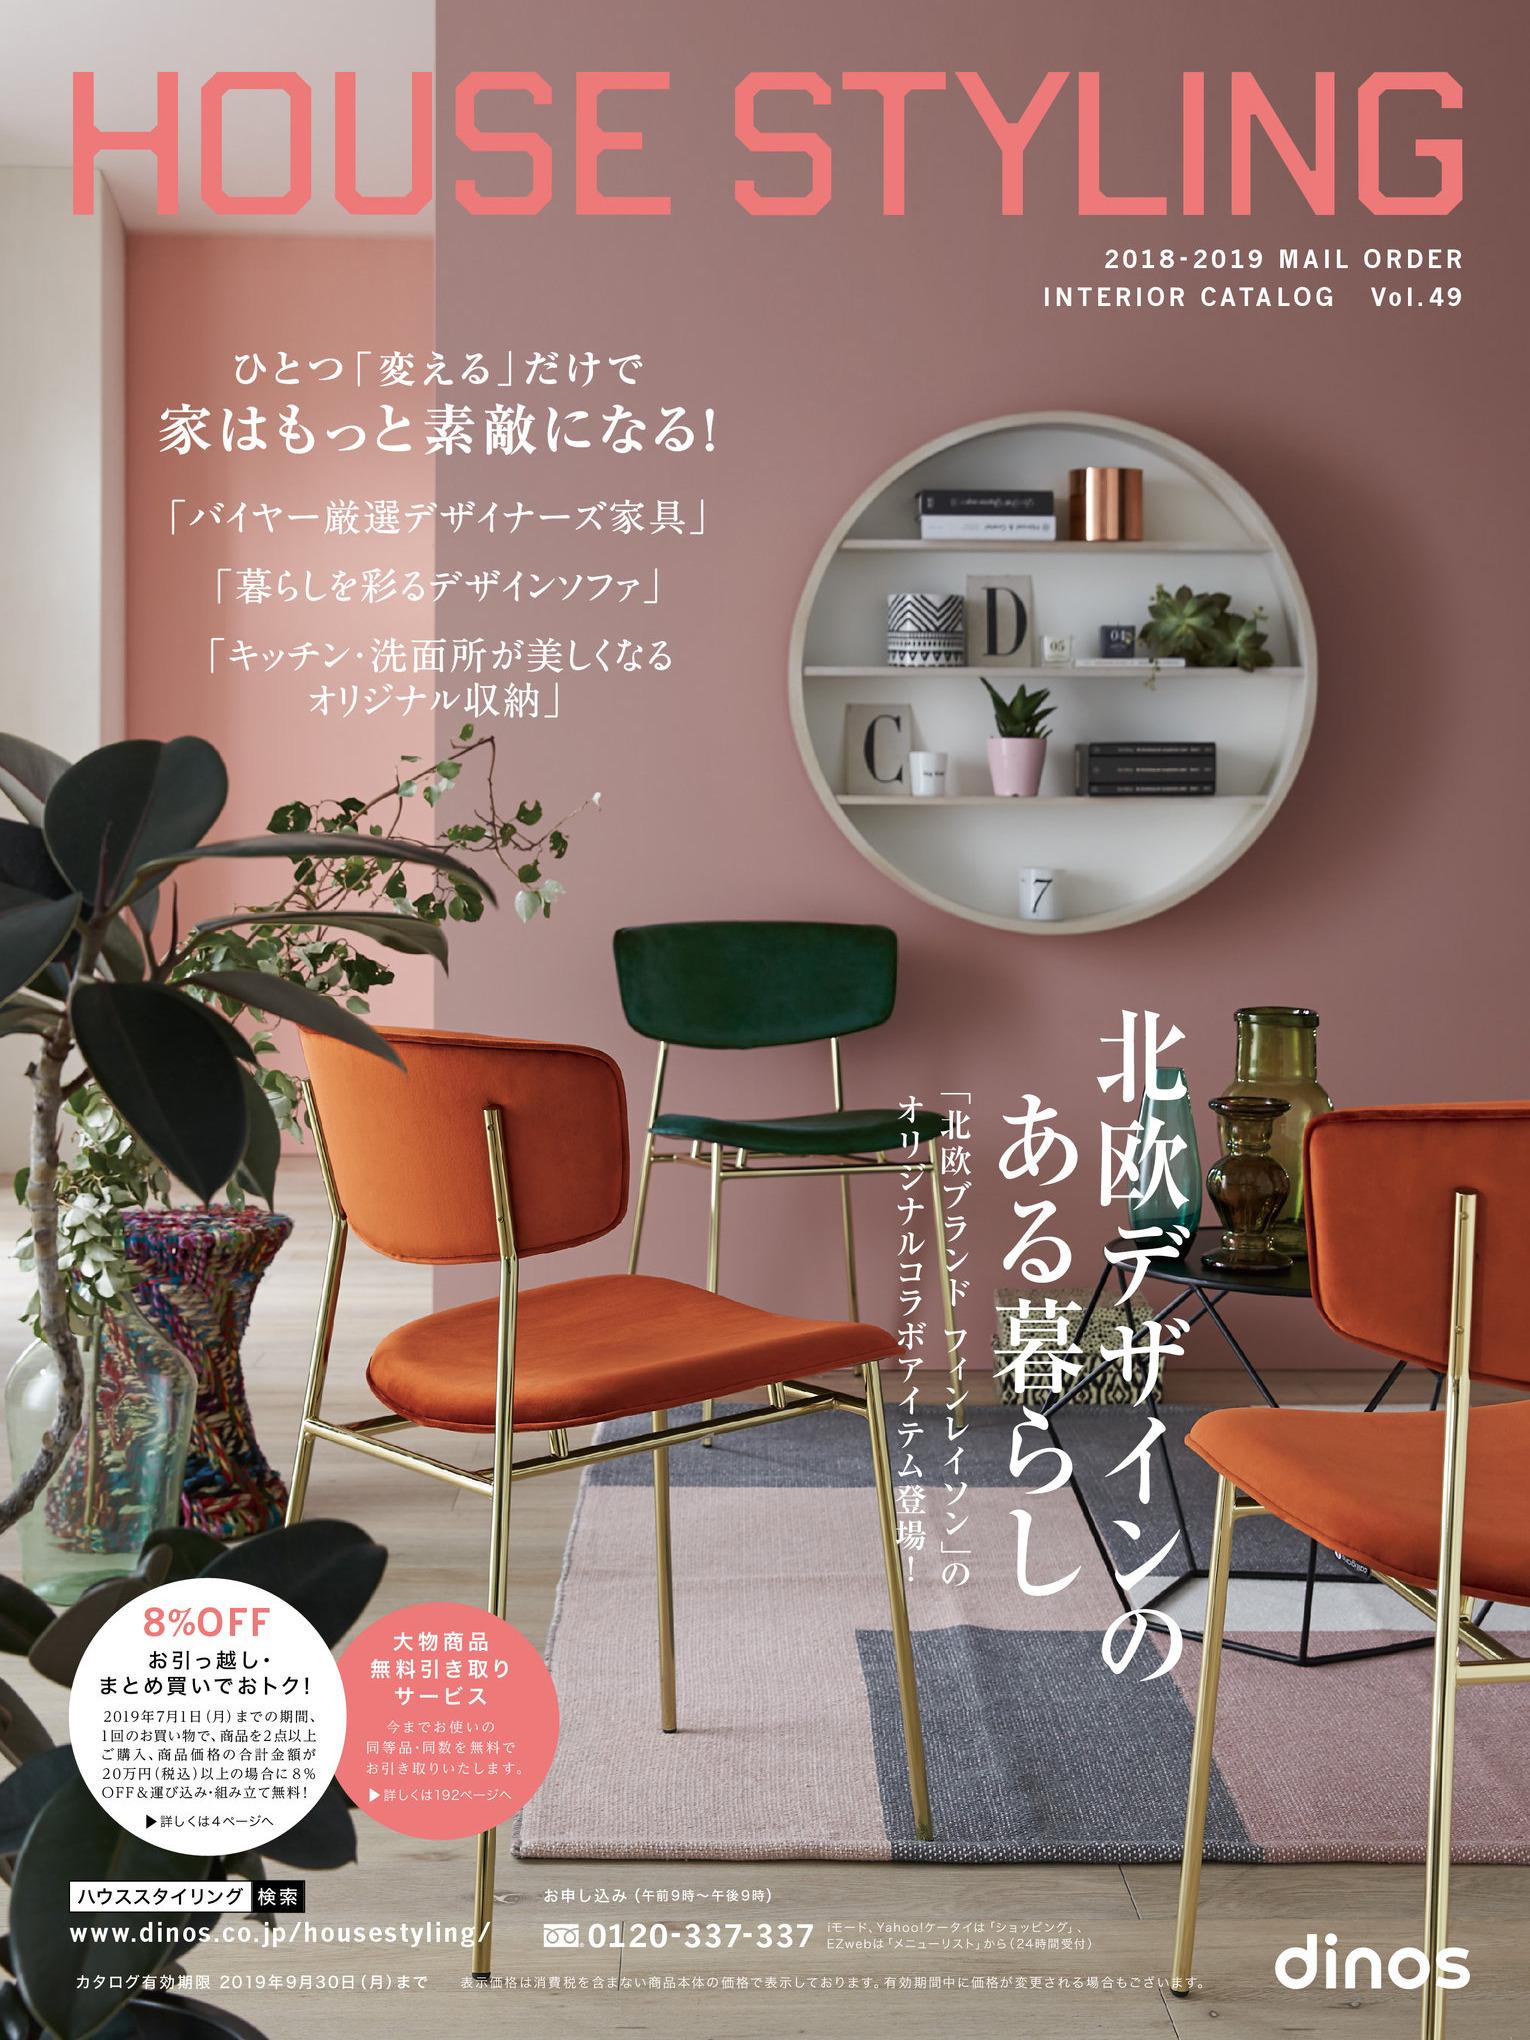 《House Styling》日本版时尚布艺杂志2018-2019年秋冬号